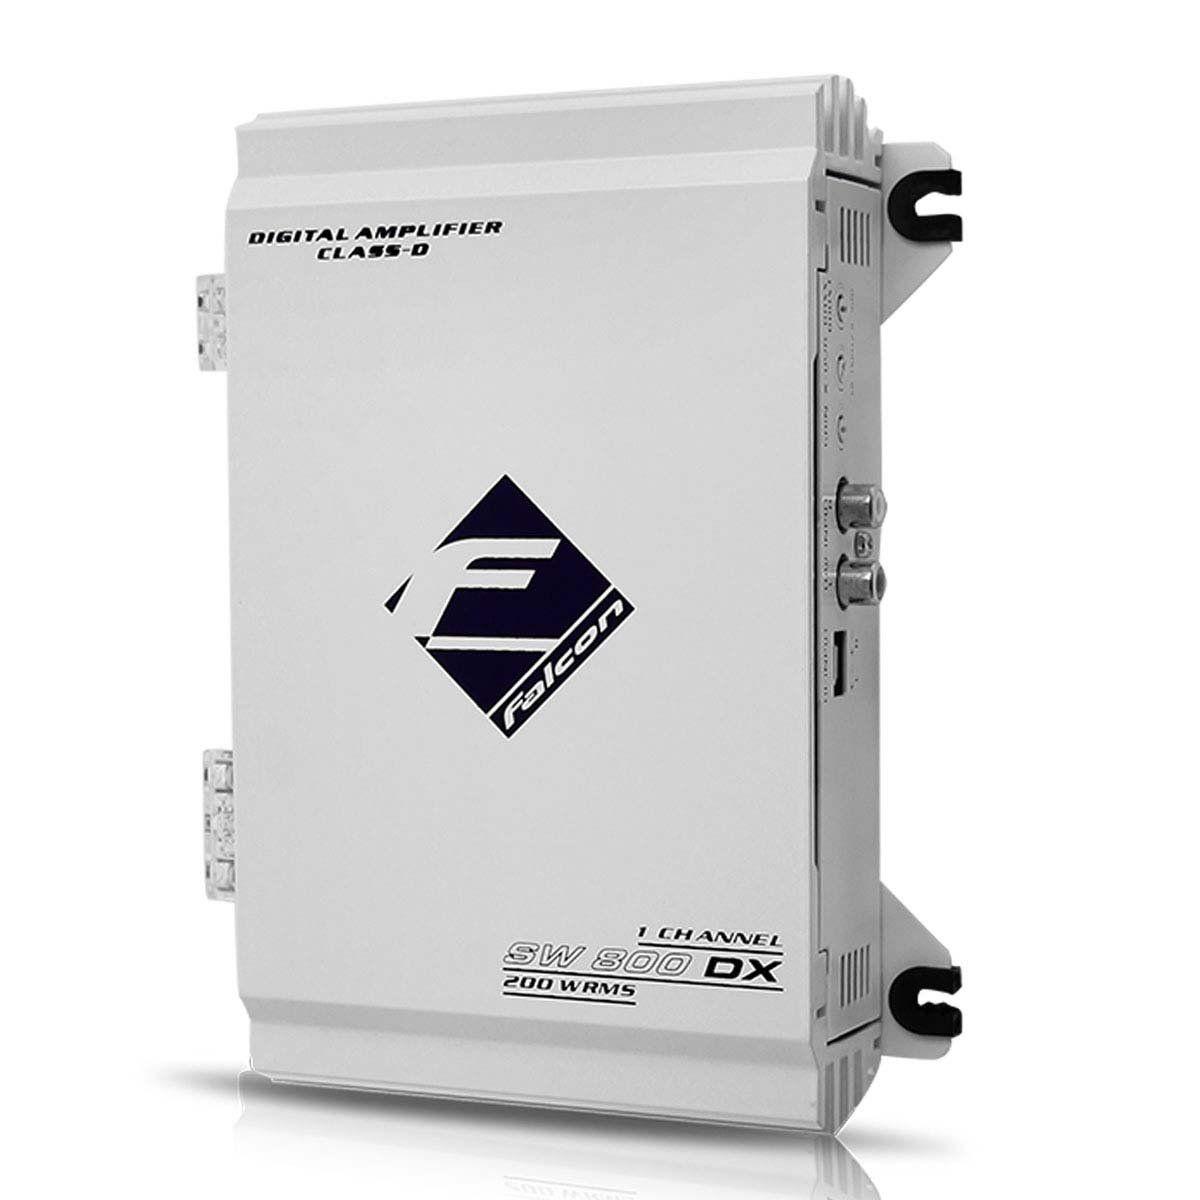 Módulo Amplificador Falcon Sw800 Dx Digital 200w Rms 1 Canal